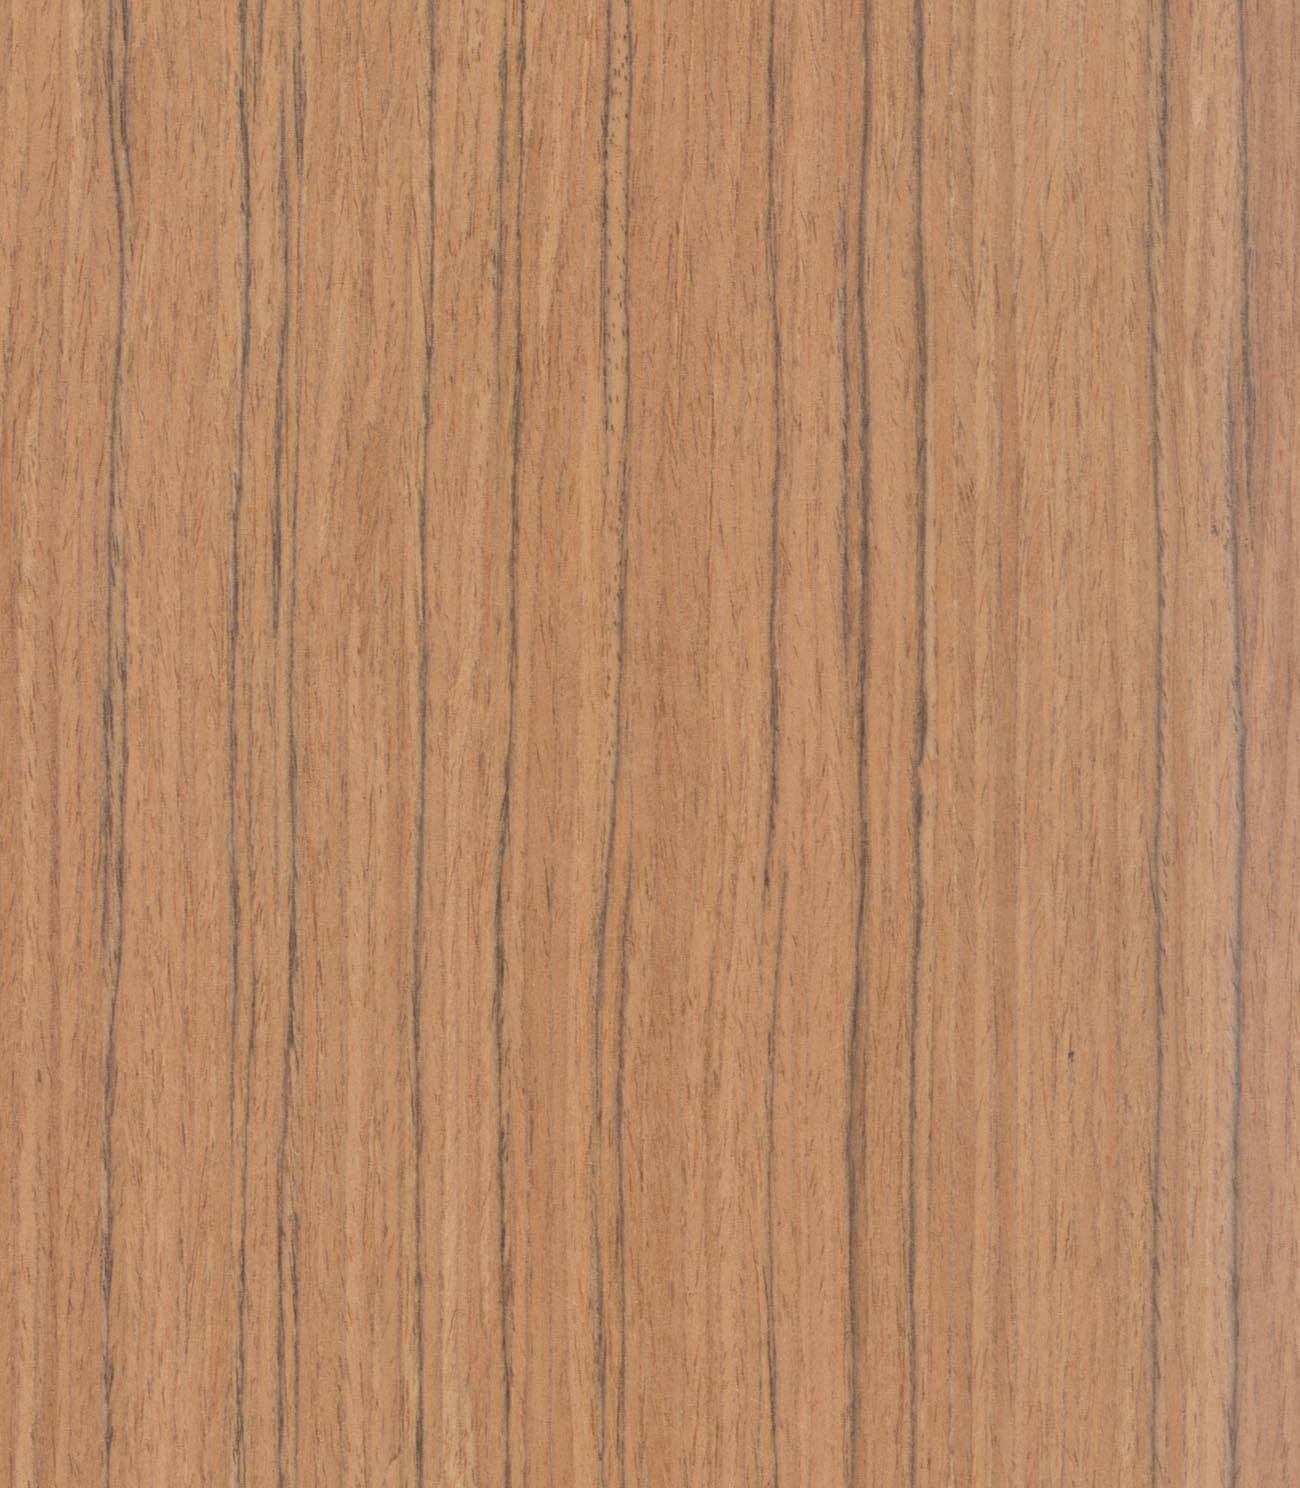 Very Impressive portraiture of Engineered Wood veneer  teak206 Shandong Kaiyuan Wood Industry Co  with #8C603F color and 1300x1488 pixels